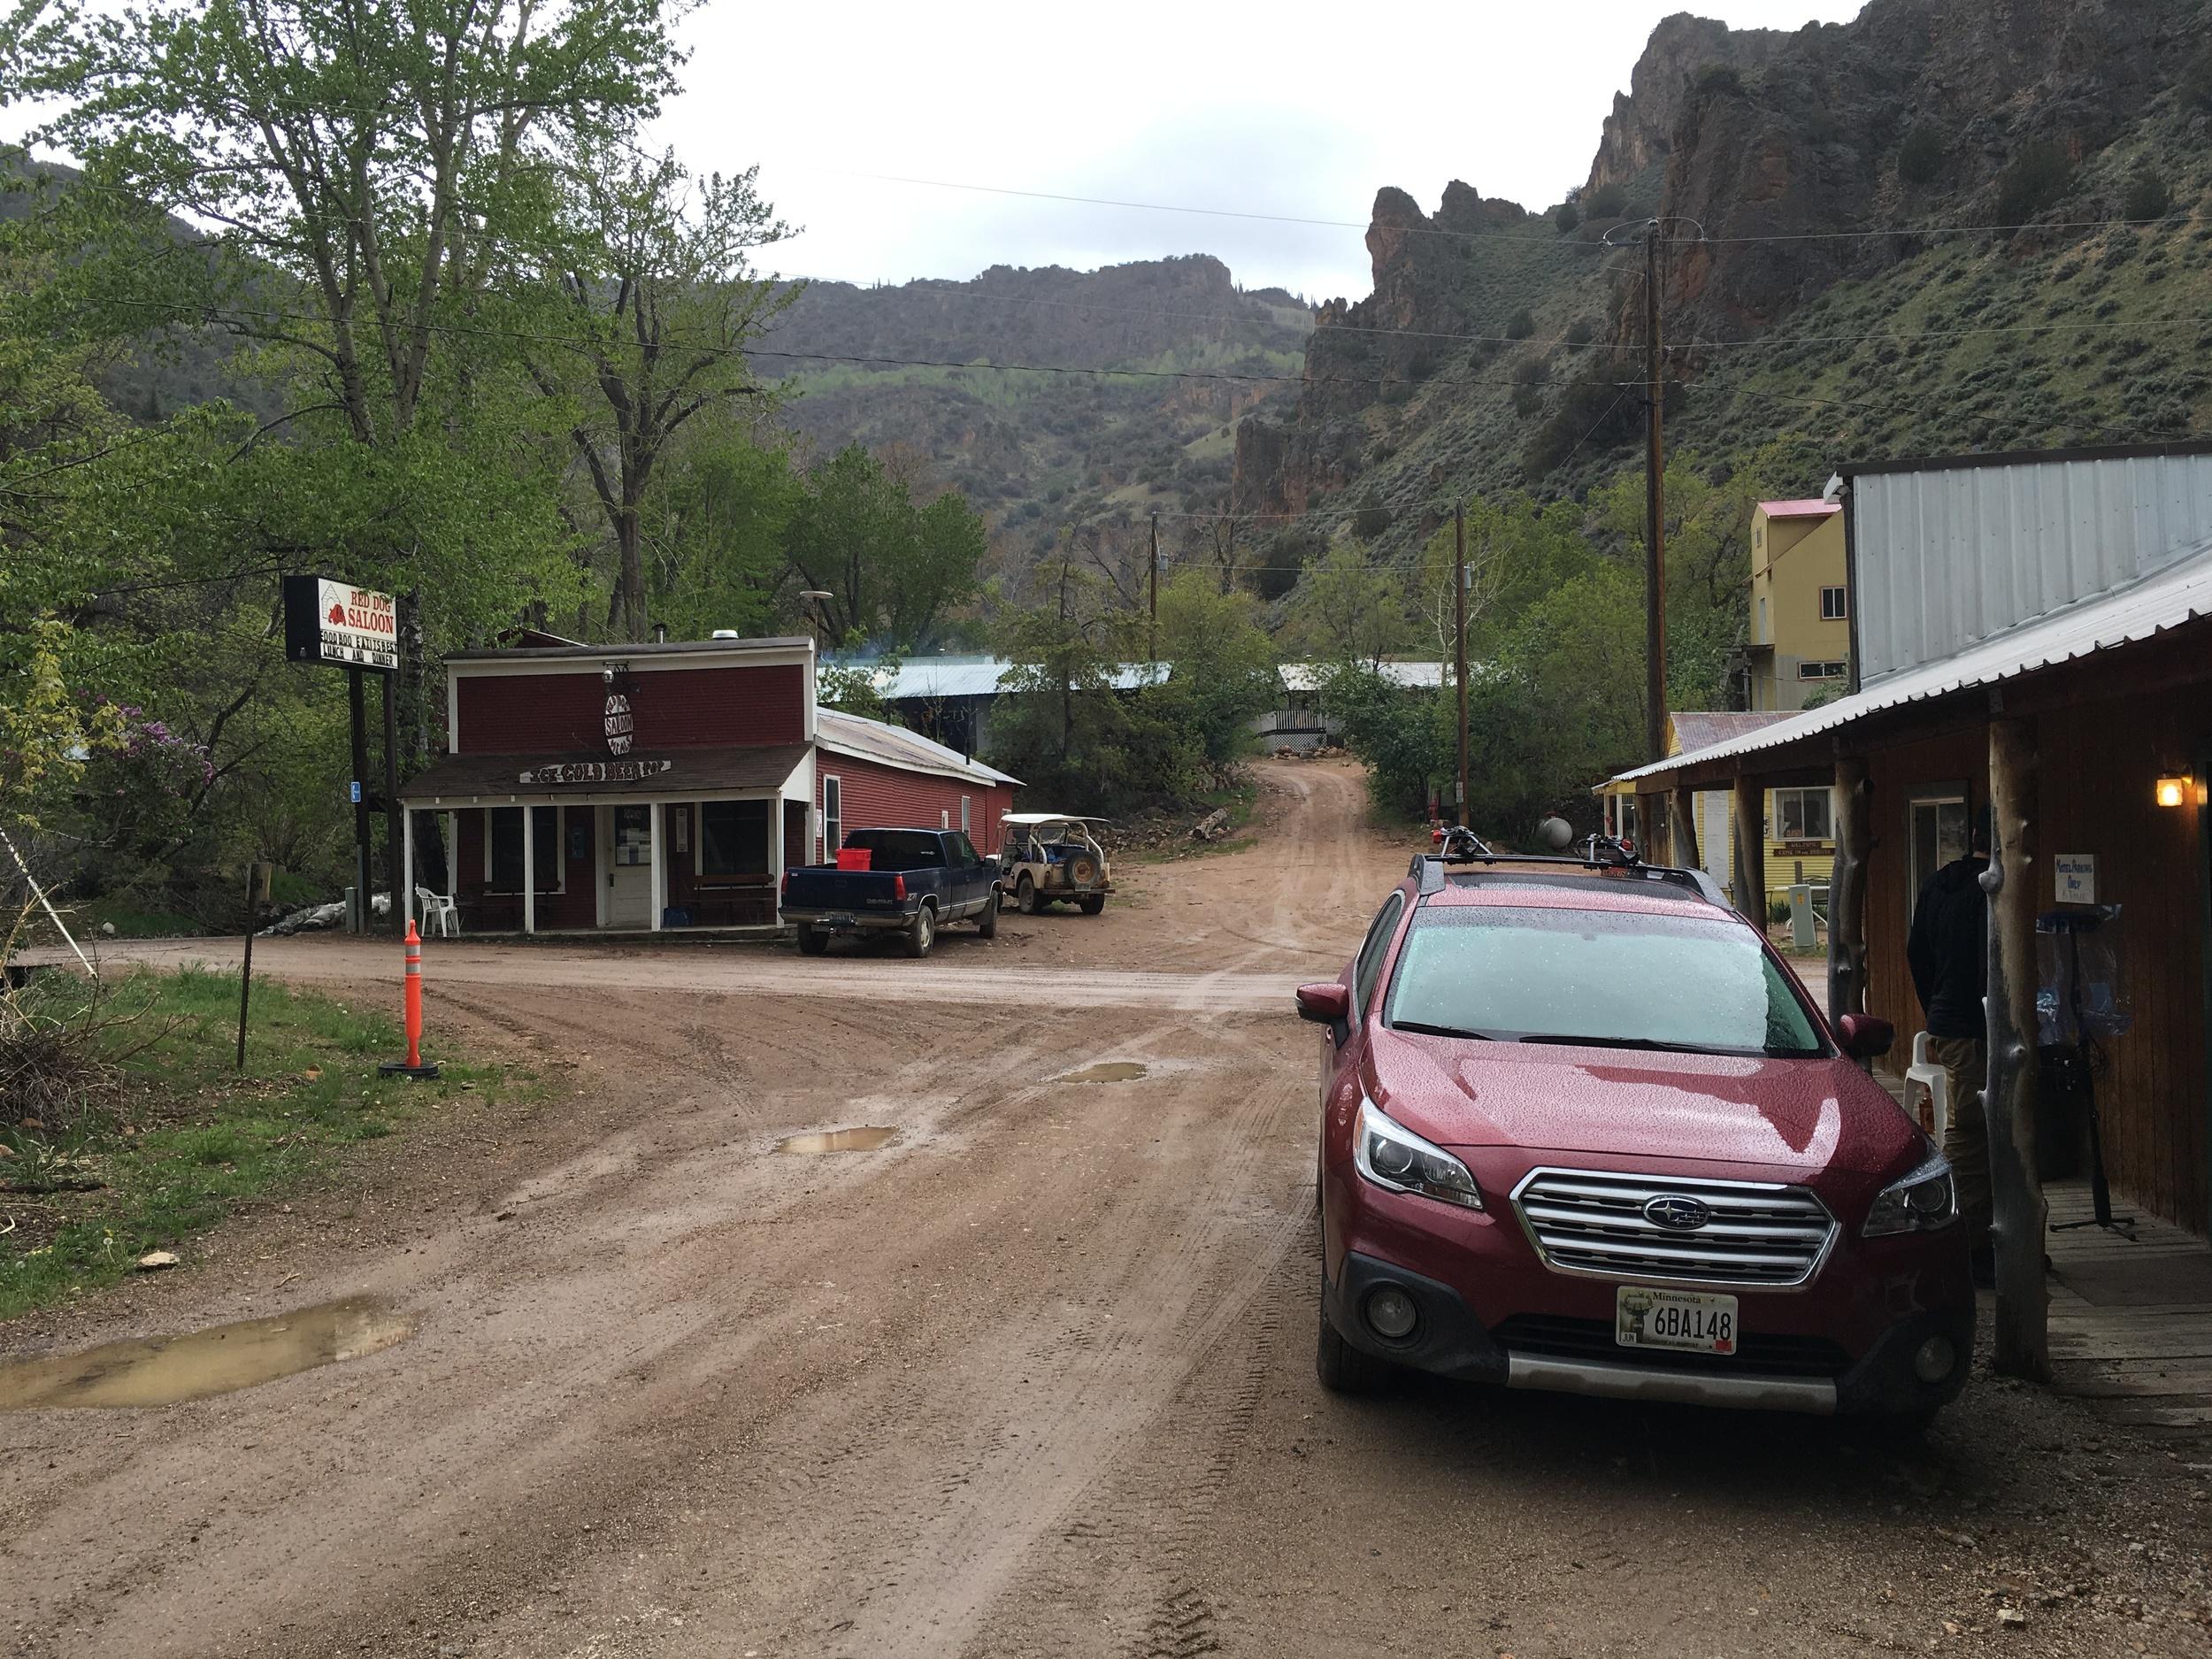 Unloading the Subaru in Jarbidge, Nevada